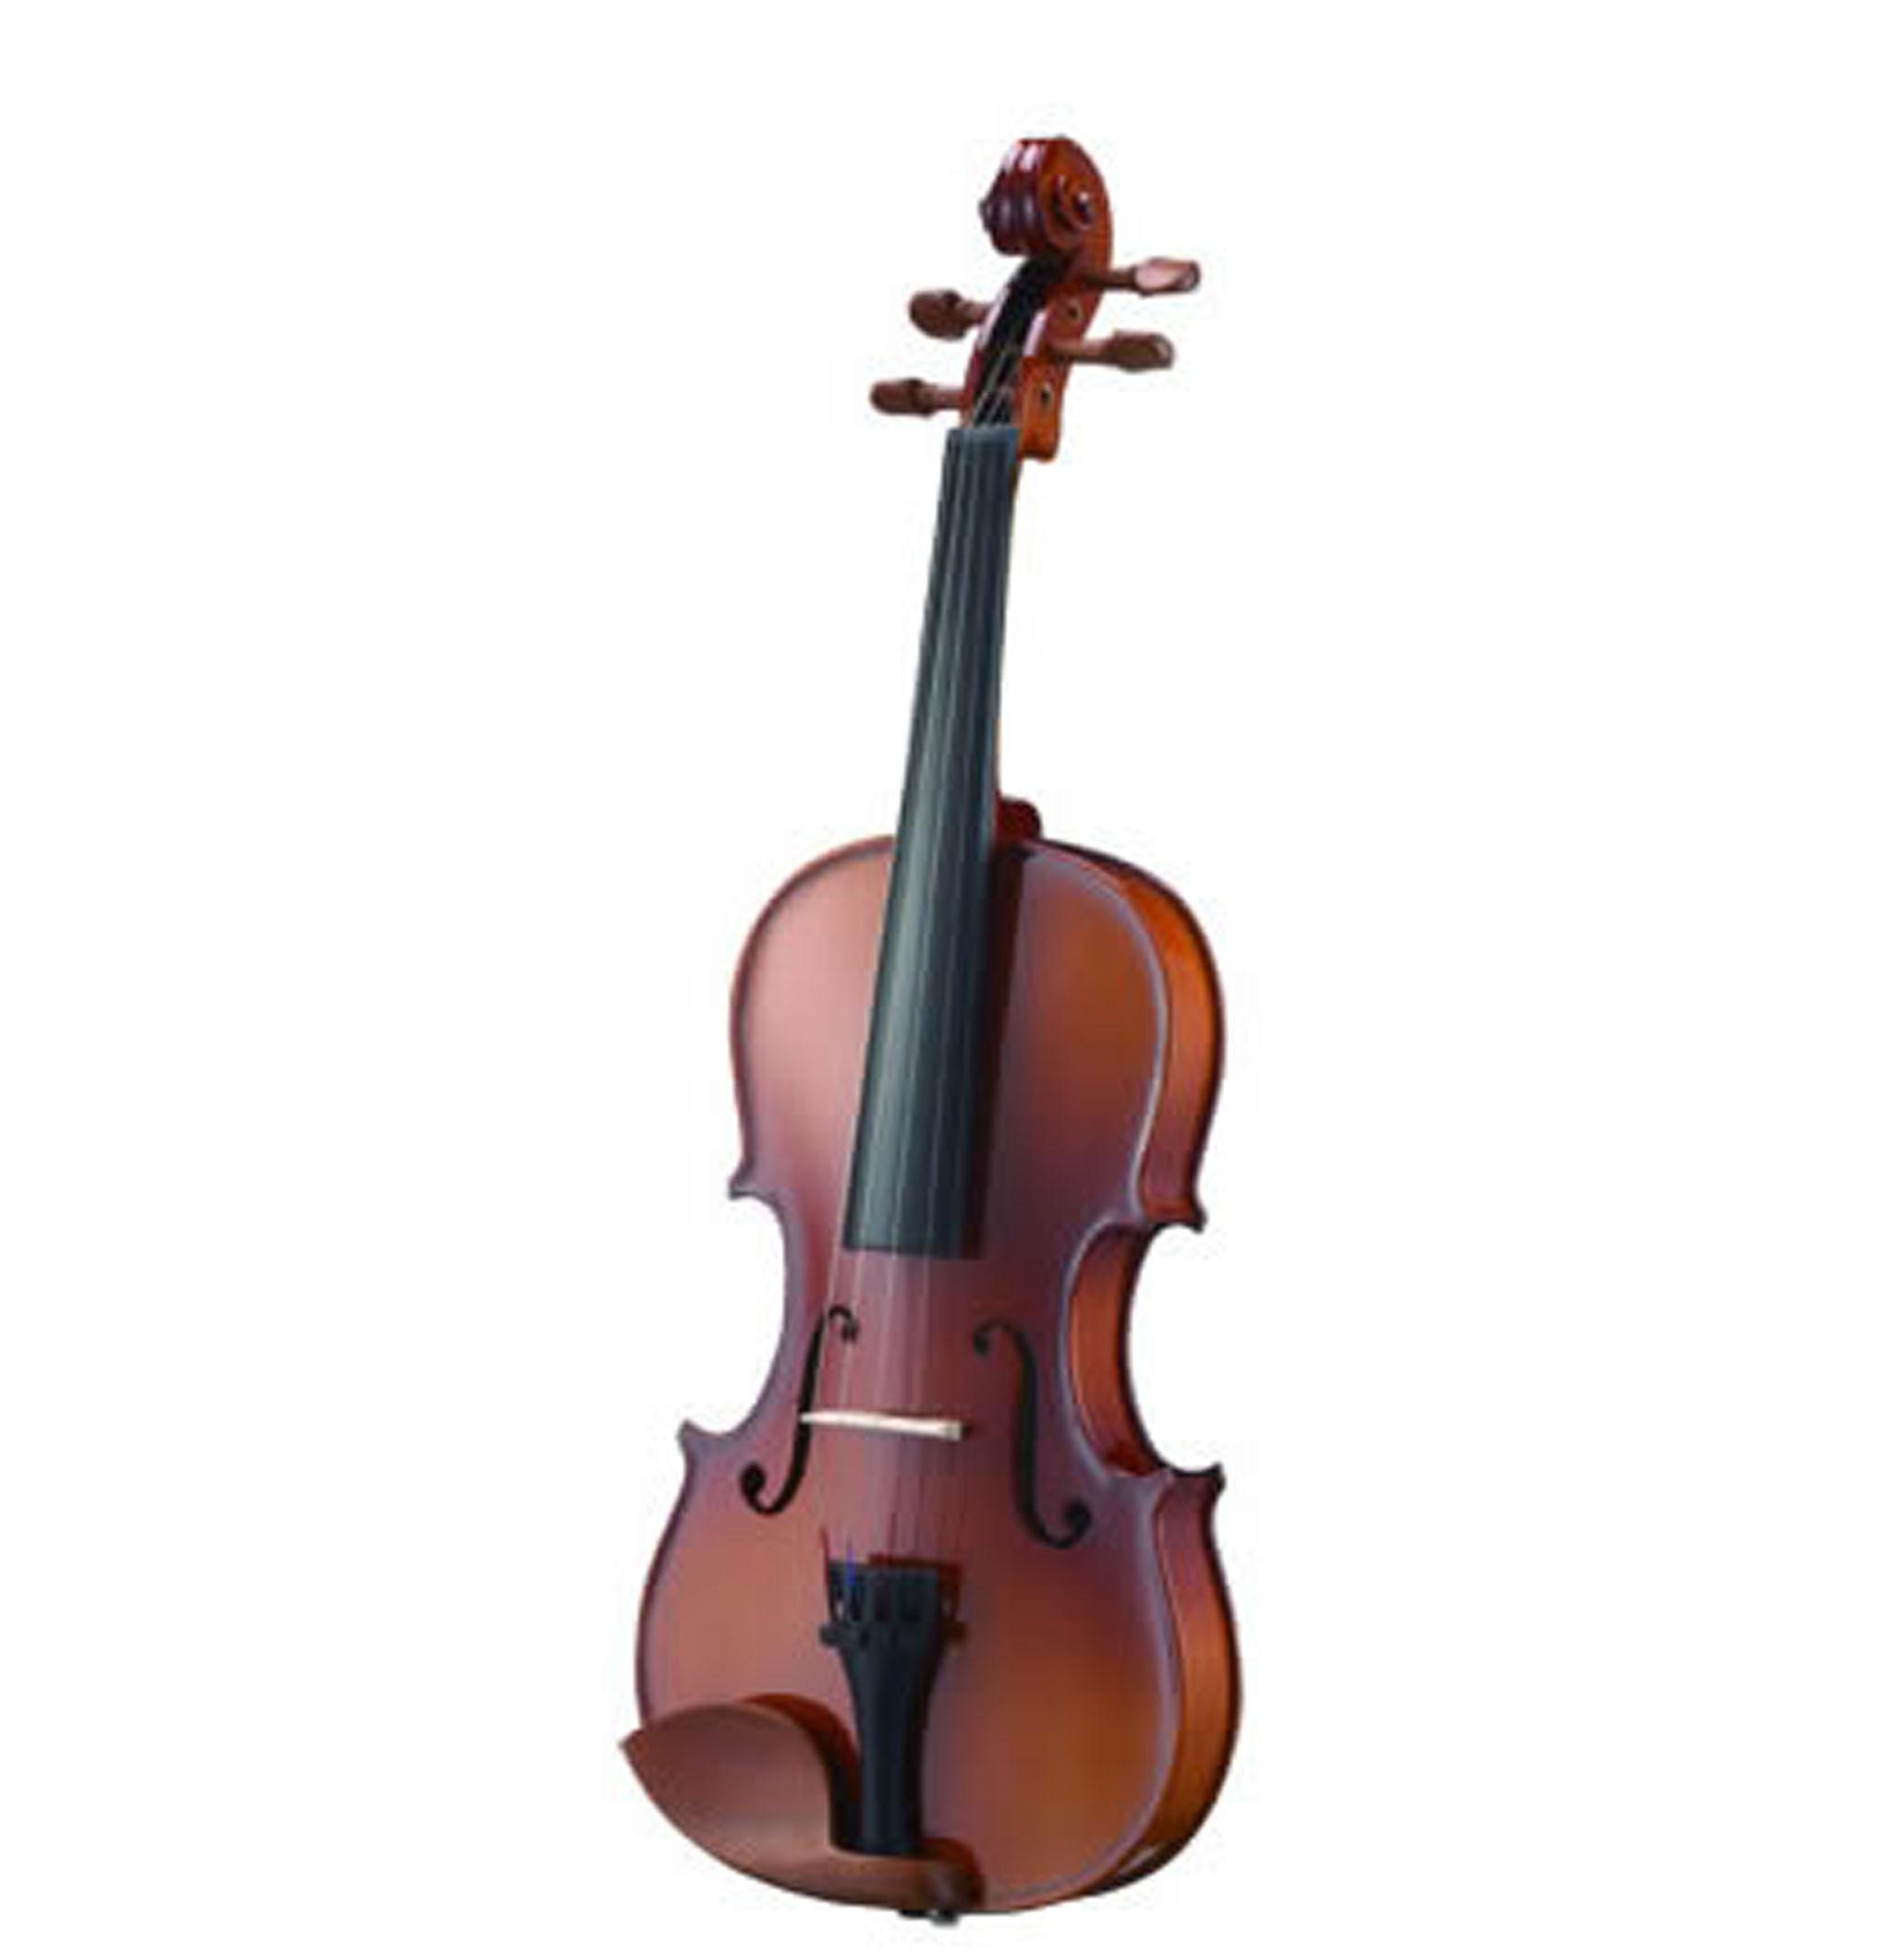 Đàn Violin Lazer LV-001 Size 3/4